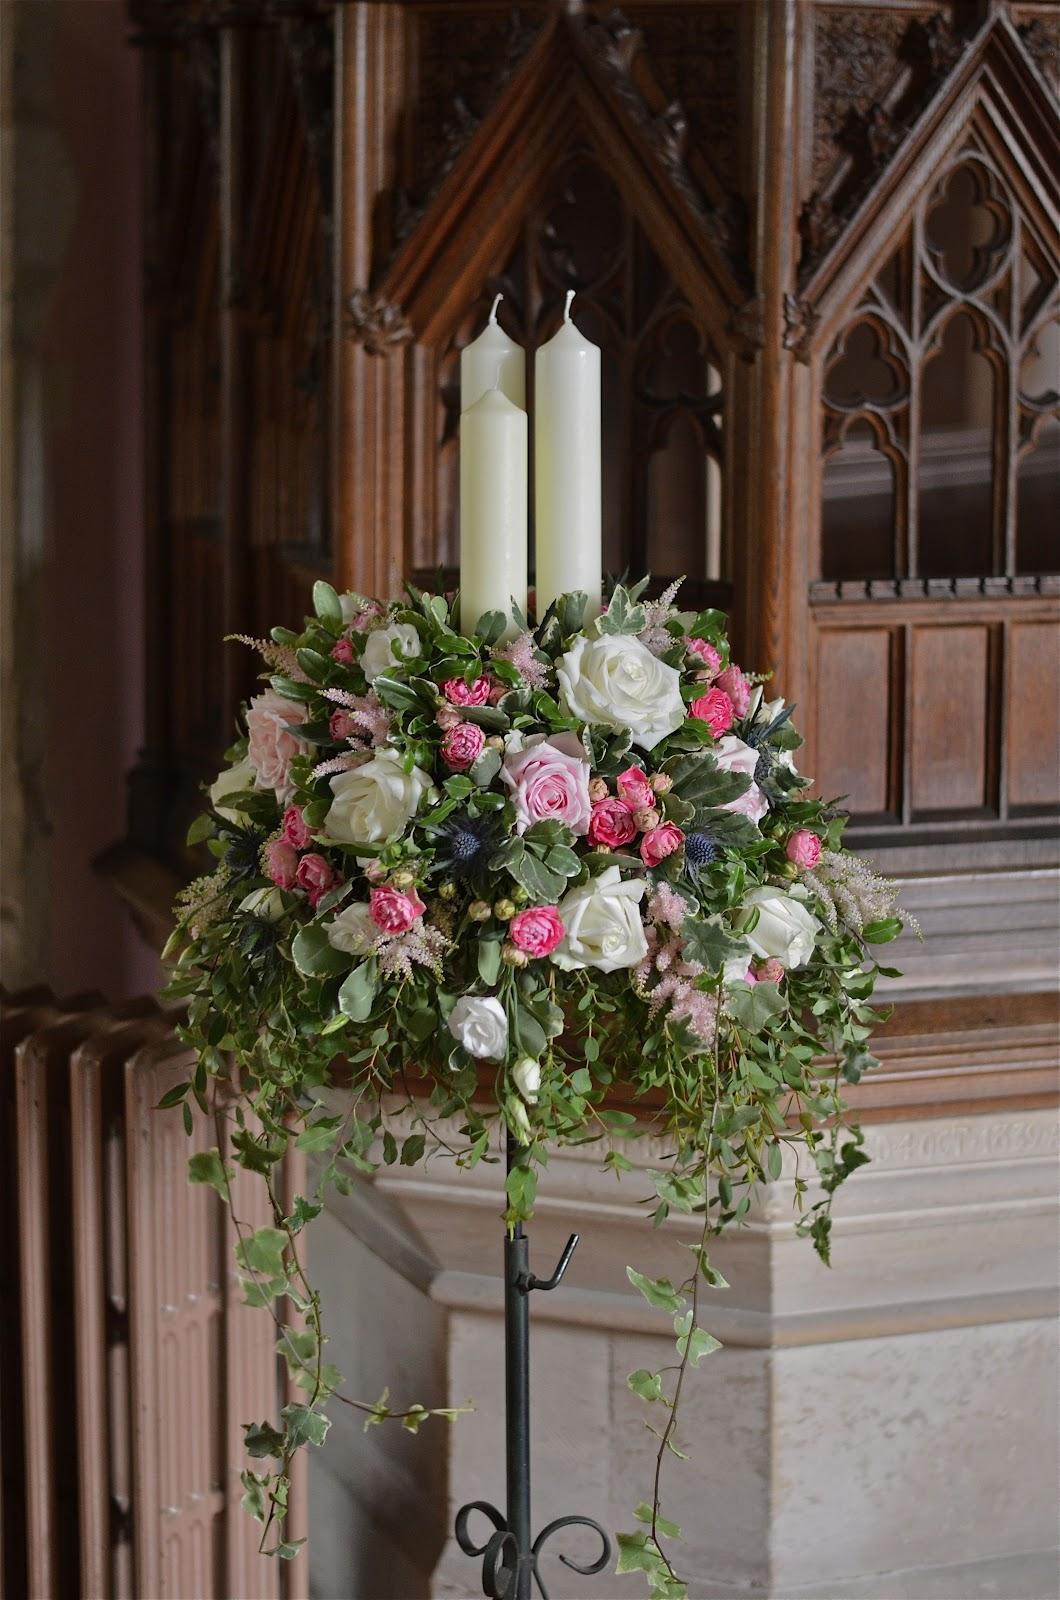 wedding flowers blog penny 39 s wedding flowers highclere castle. Black Bedroom Furniture Sets. Home Design Ideas